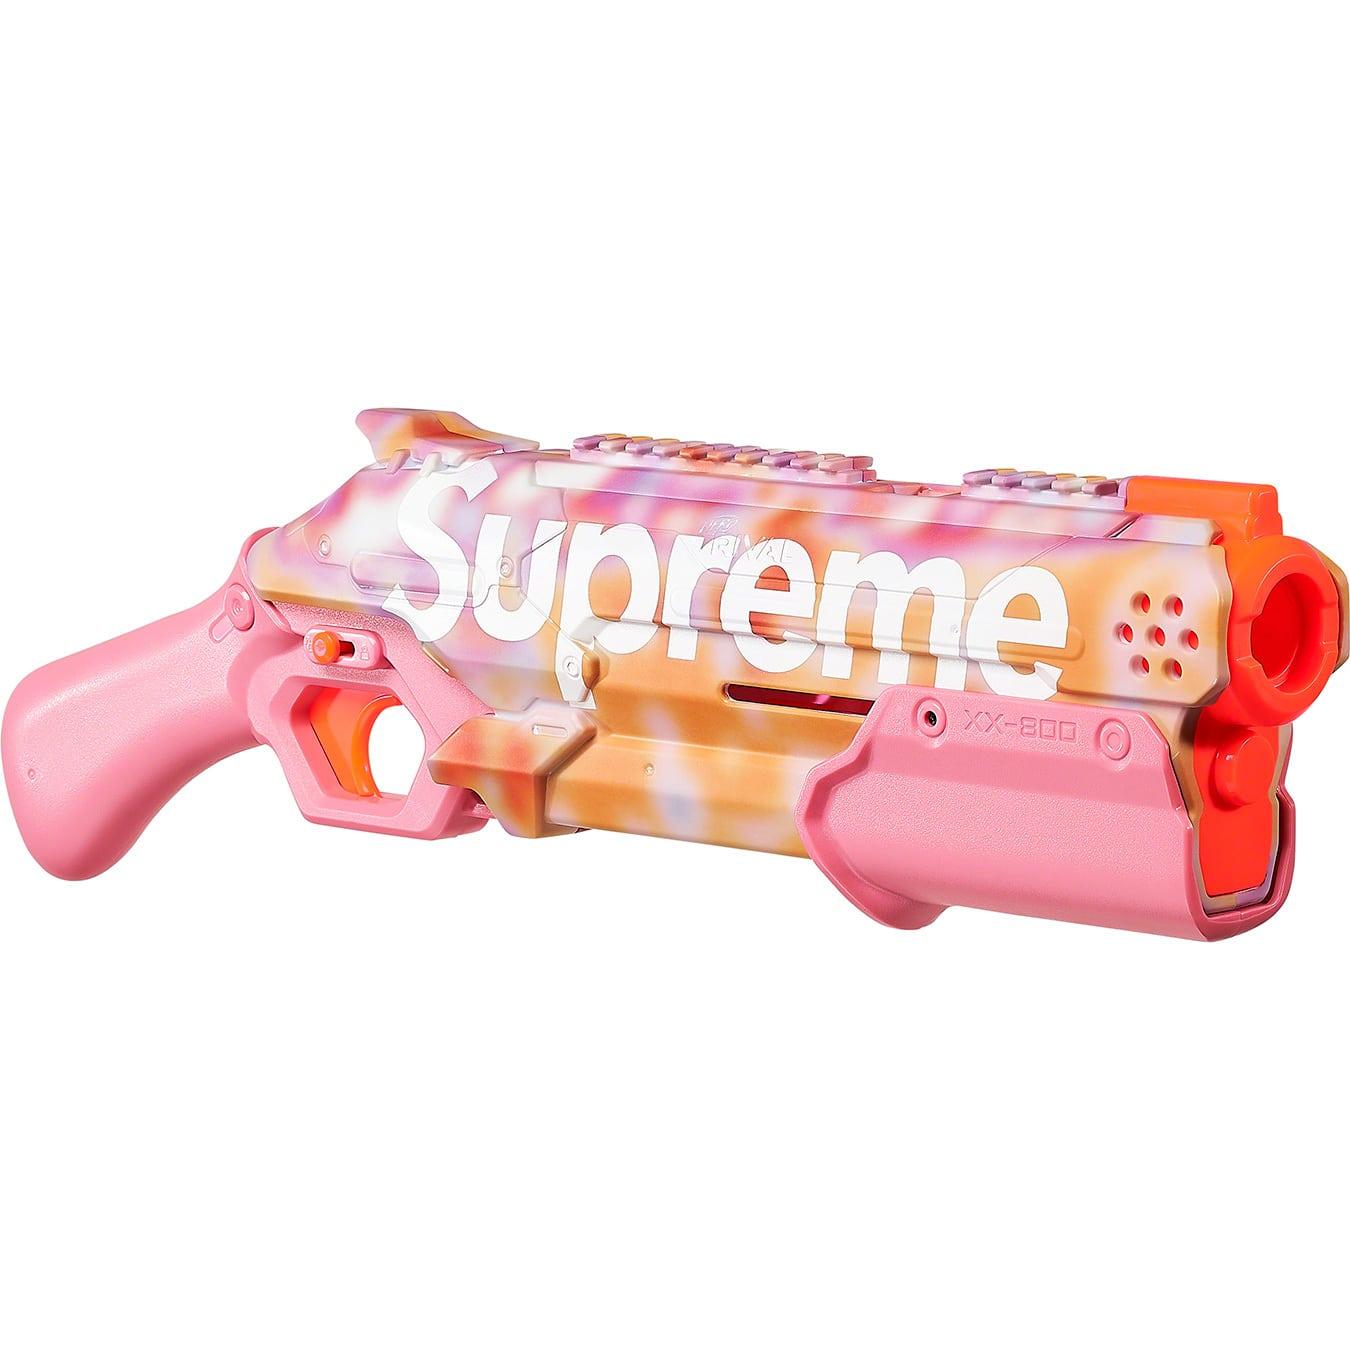 Supreme/Nerf Rival Takedown Blaster